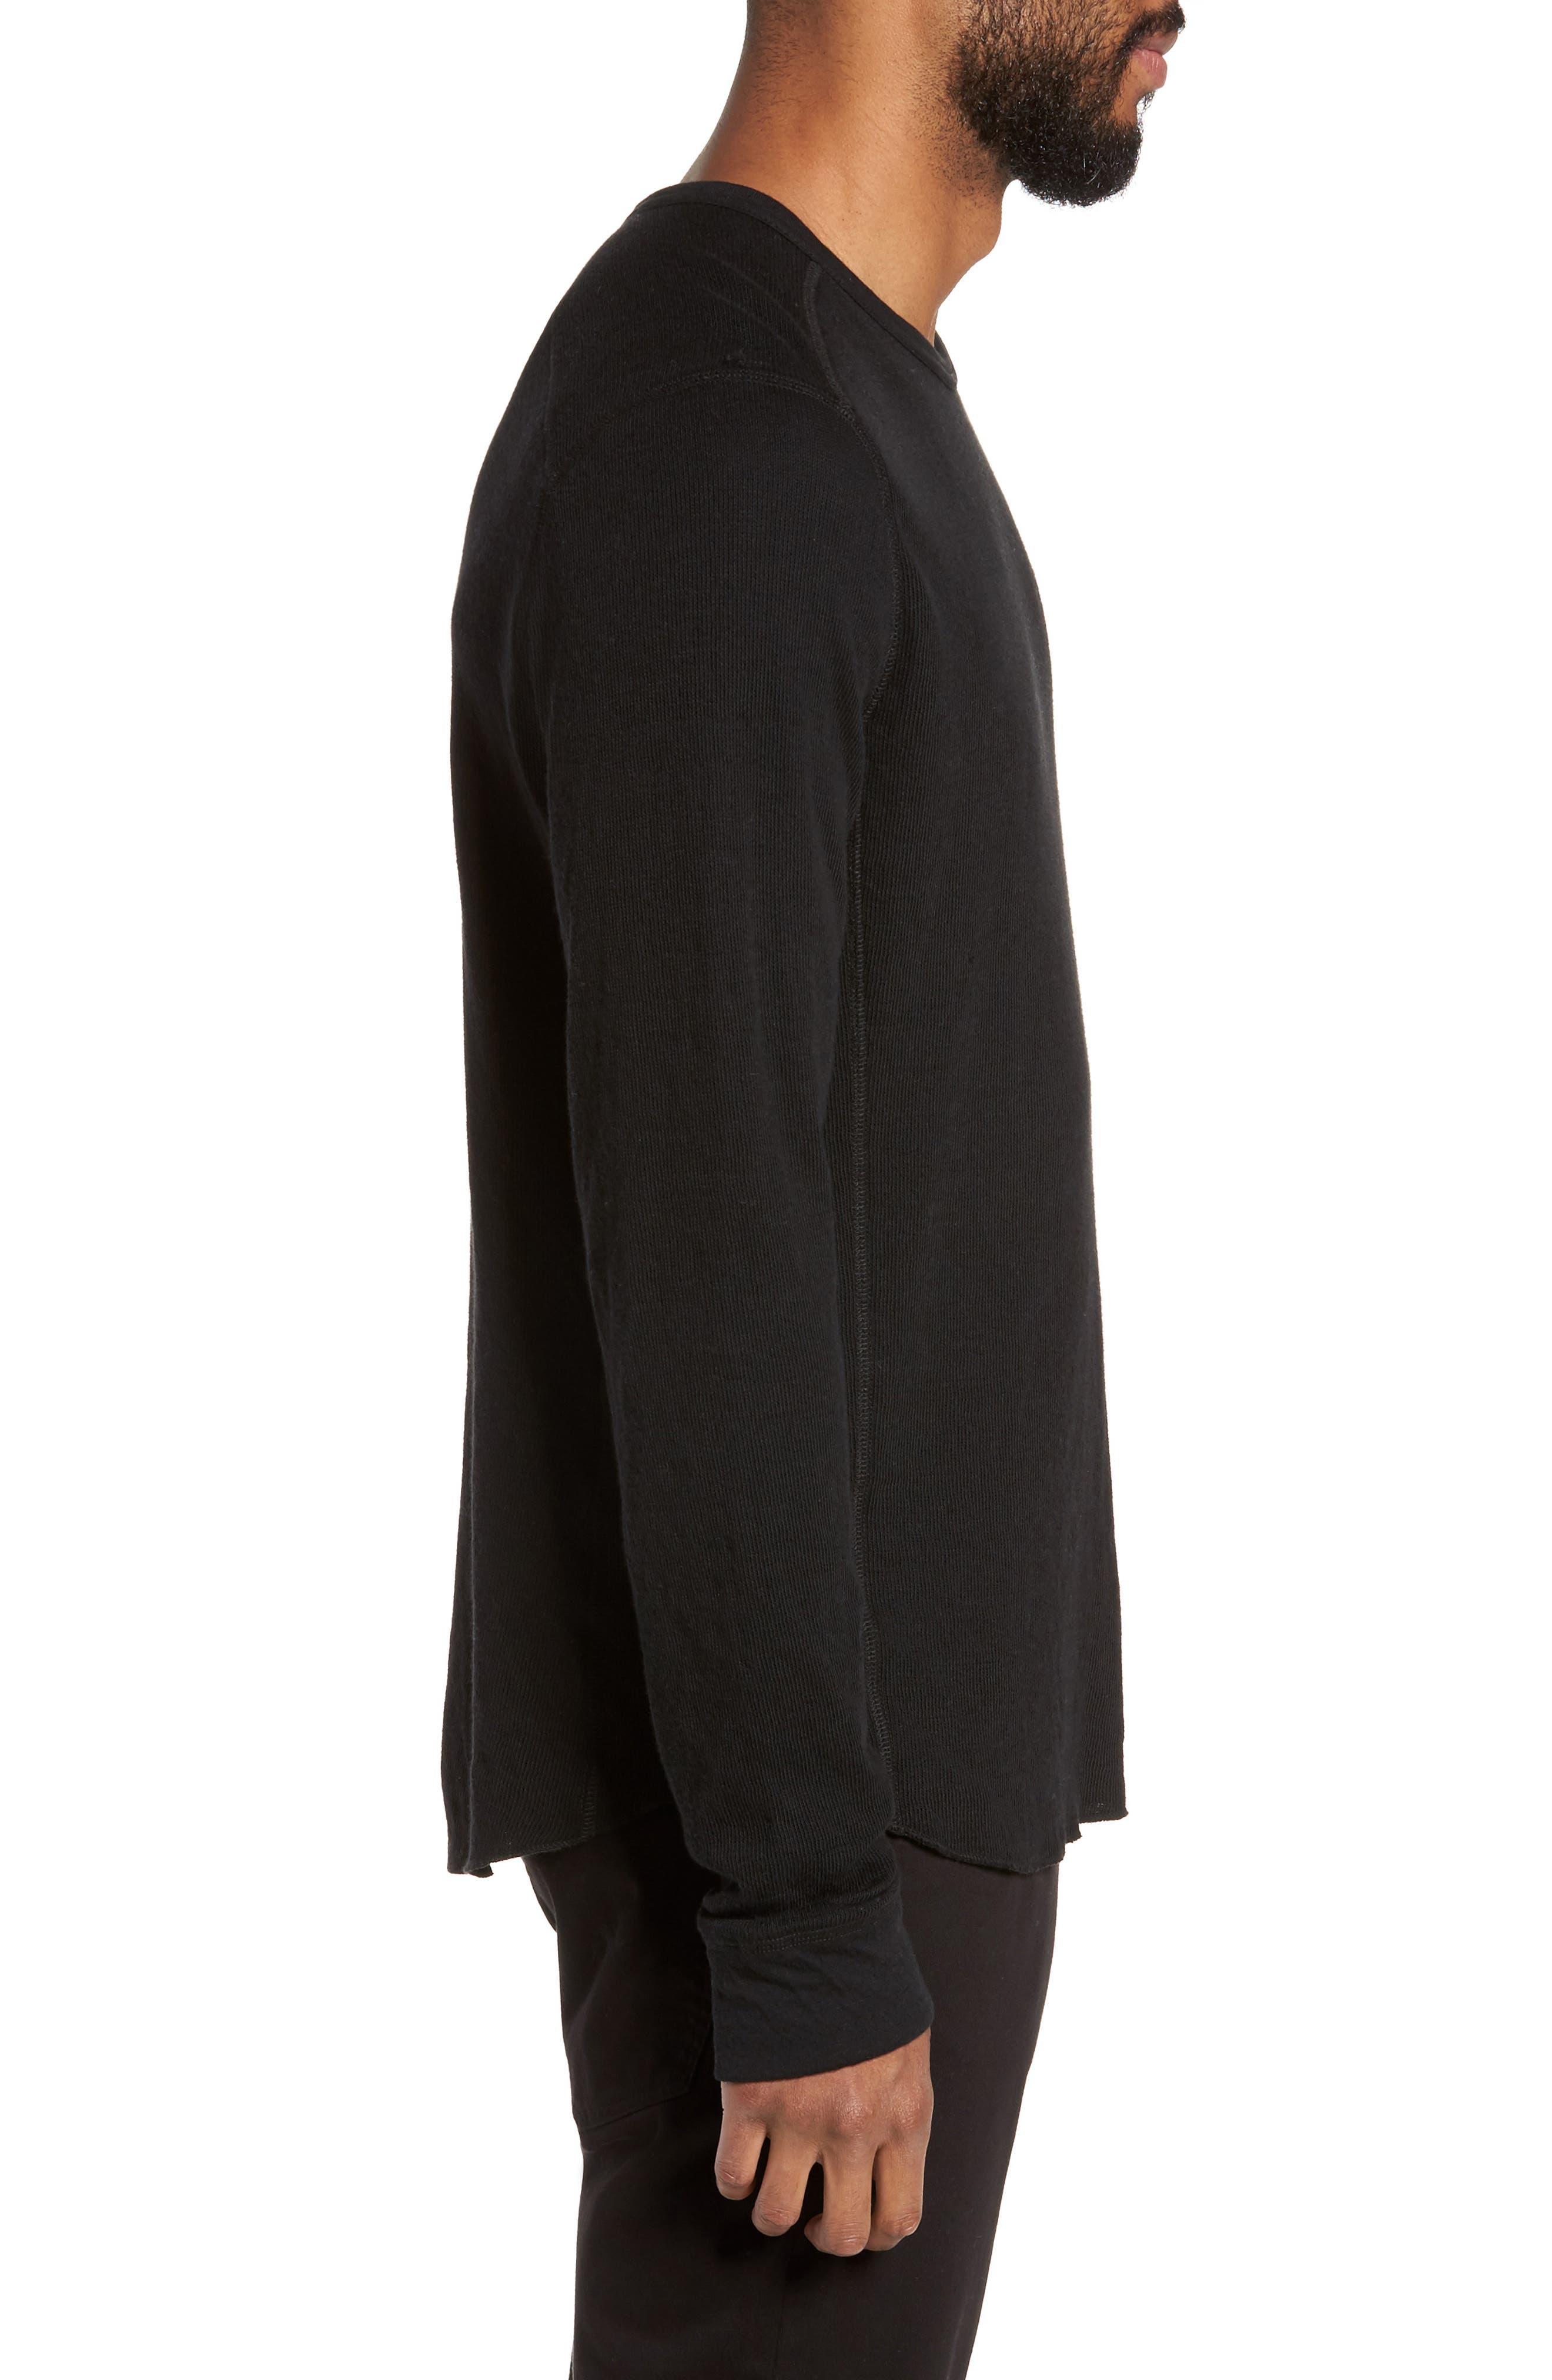 VINCE, Double Knit Long Sleeve T-Shirt, Alternate thumbnail 3, color, BLACK